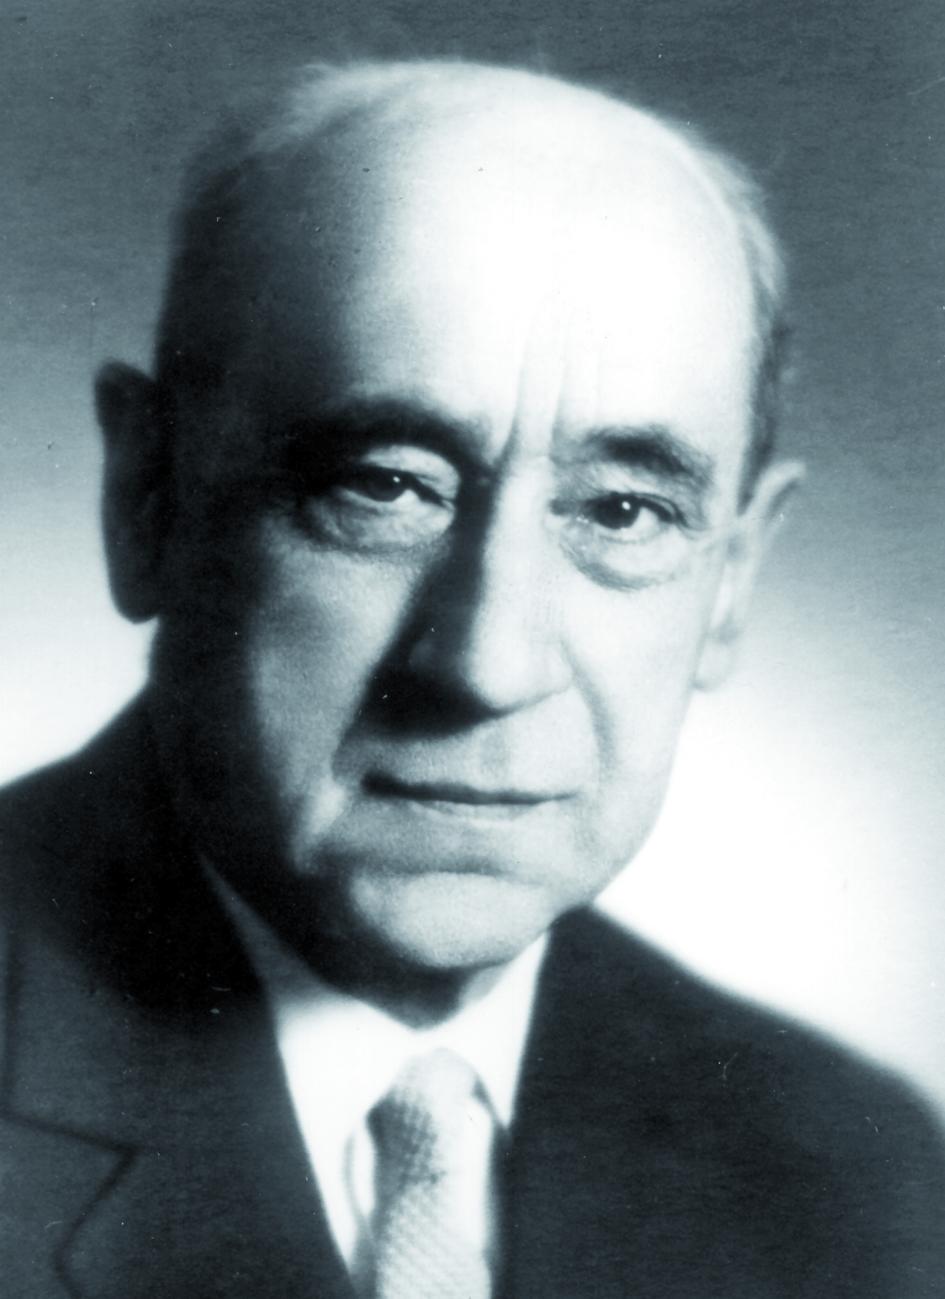 Portraitfoto von Herrn Anton Leb.